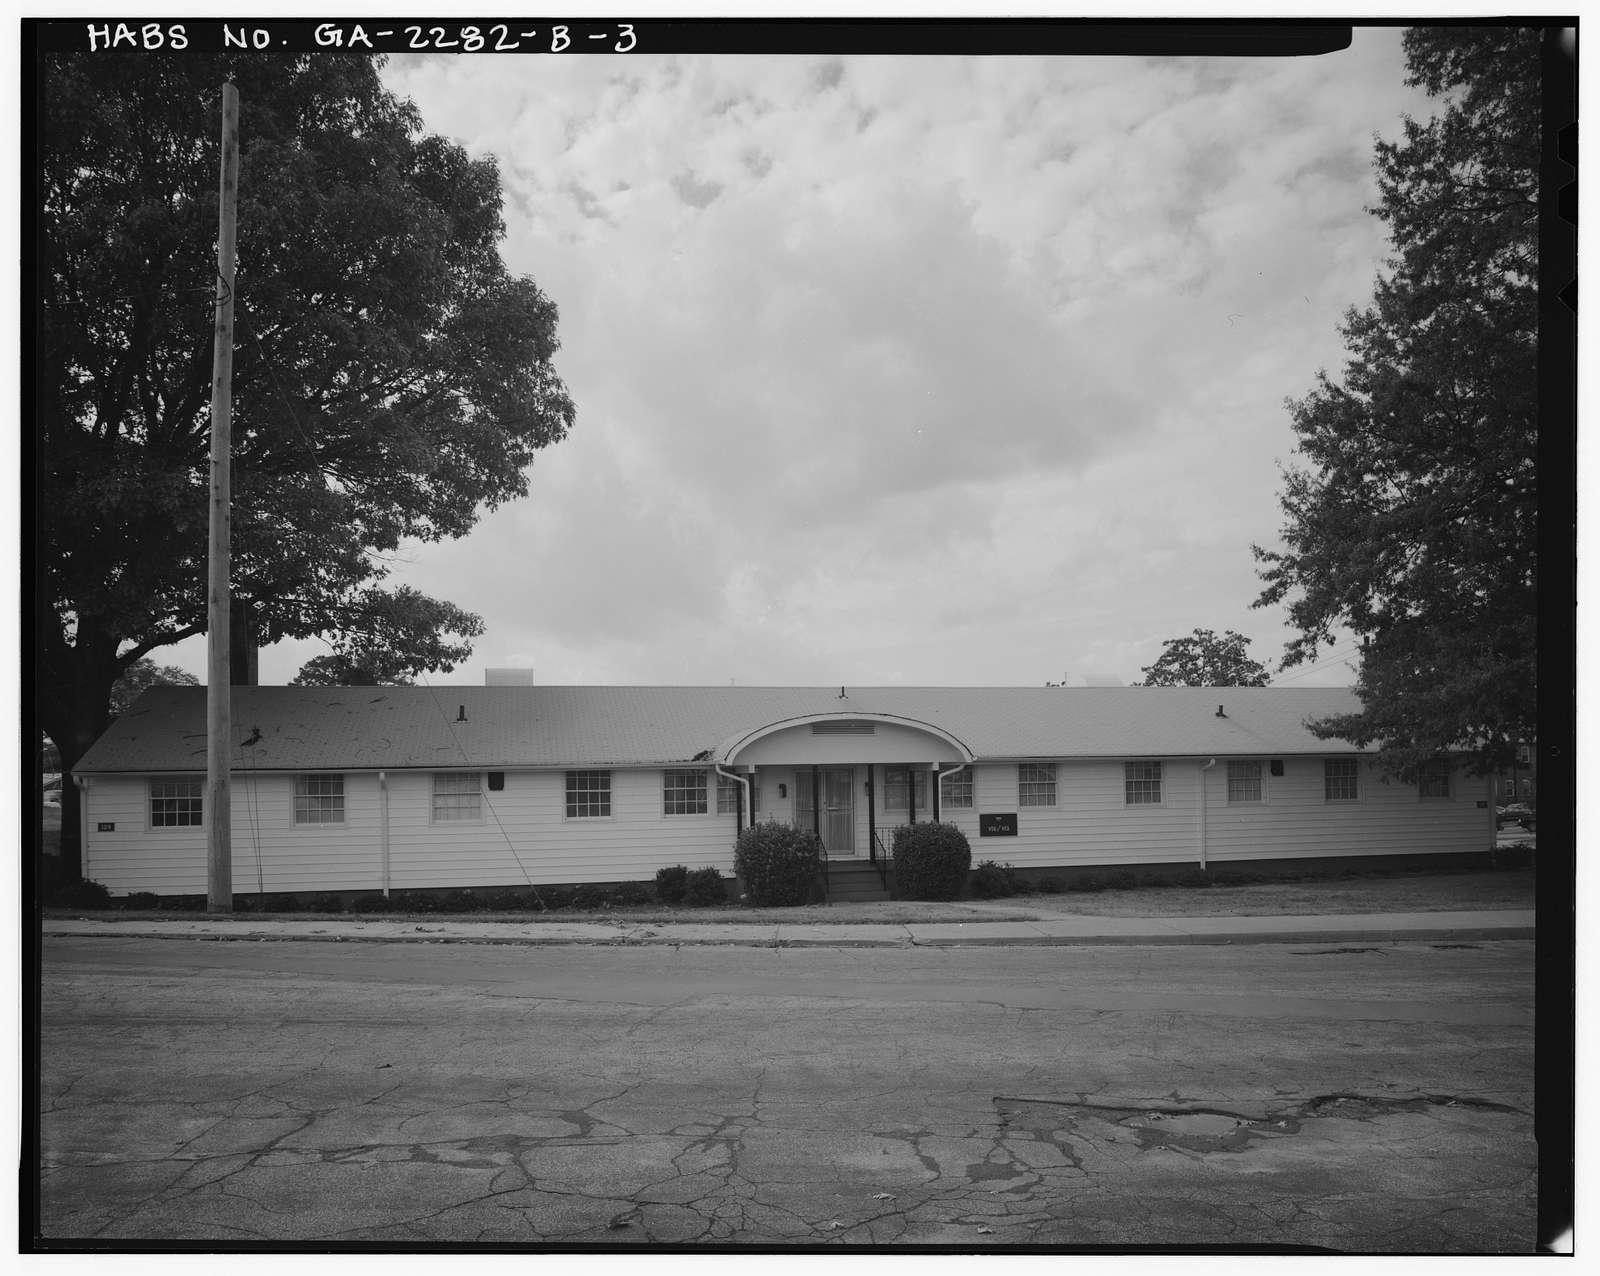 Fort McPherson, World War II Station Hospital, Nurses' Quarters, Anderson Way, Atlanta, Fulton County, GA